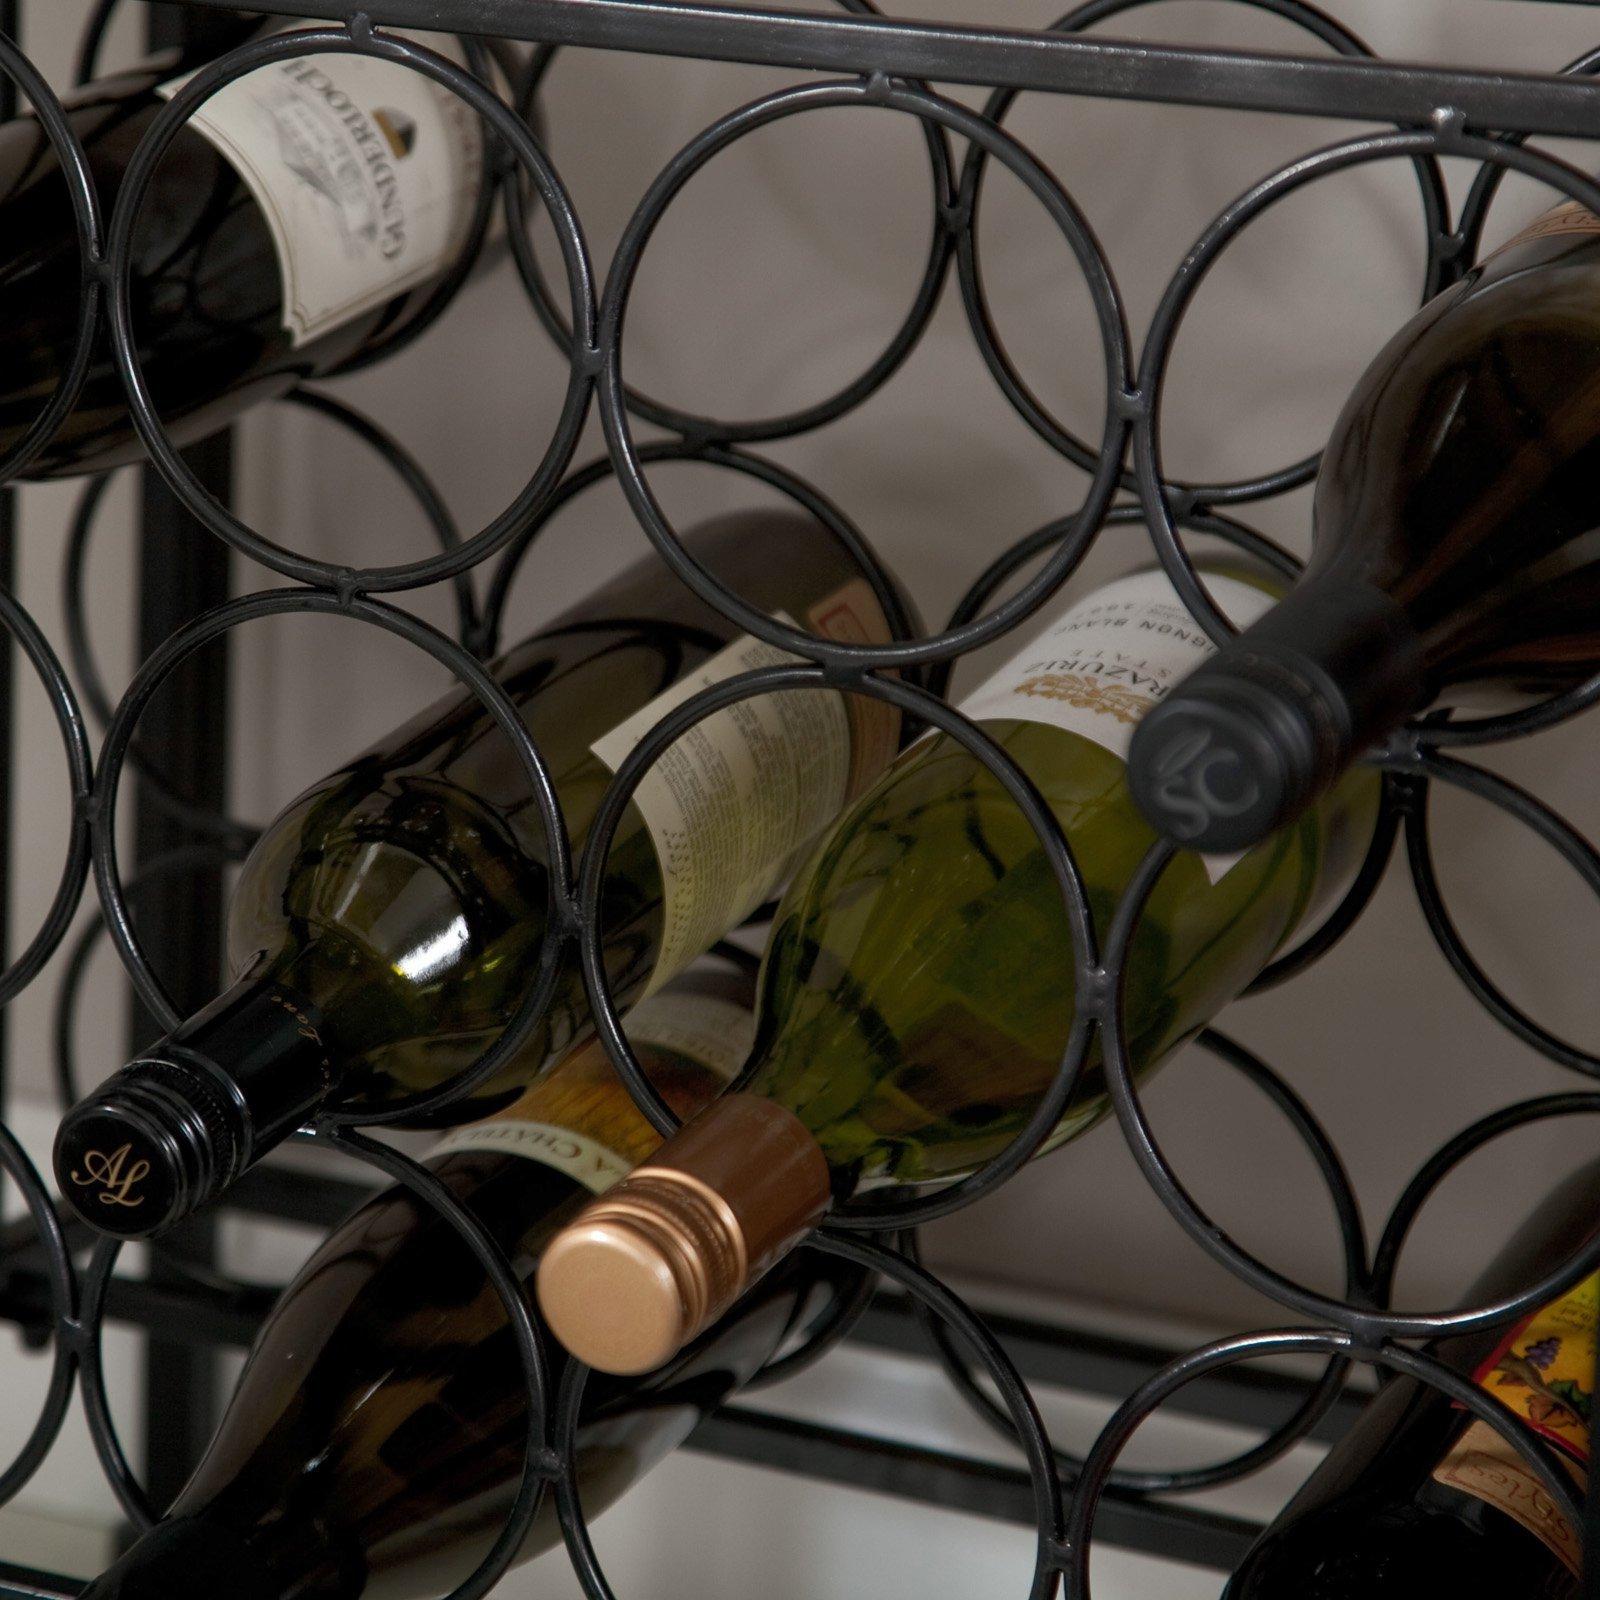 Belham Living Solano Bakers Rack with Baskets by Belham Living (Image #4)